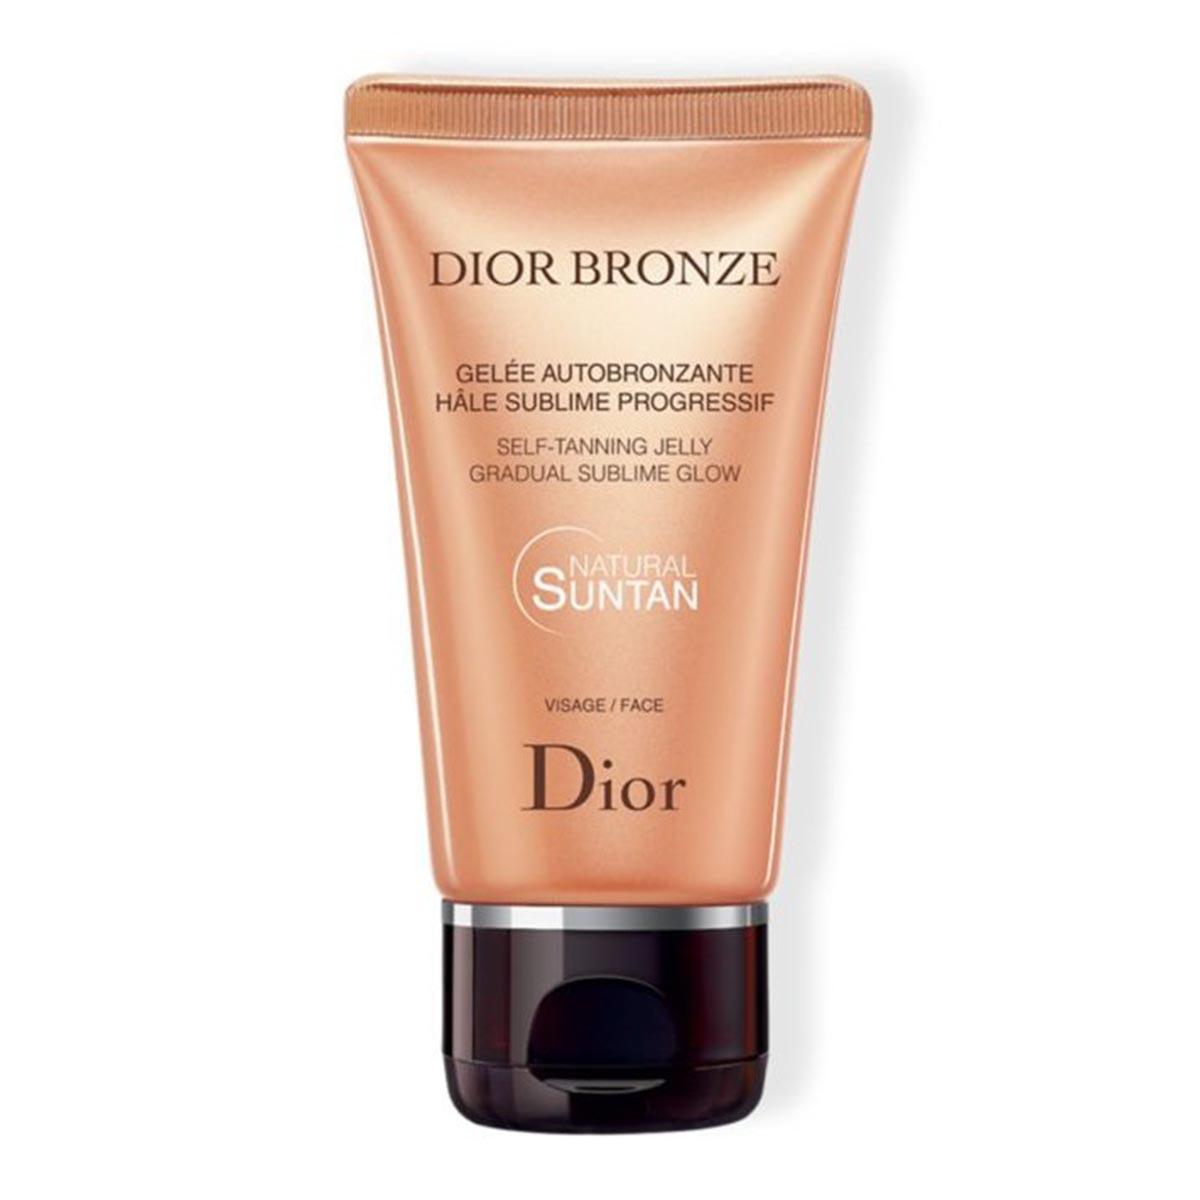 Dior bronze suntan natural self tanning jelly face crema 50ml